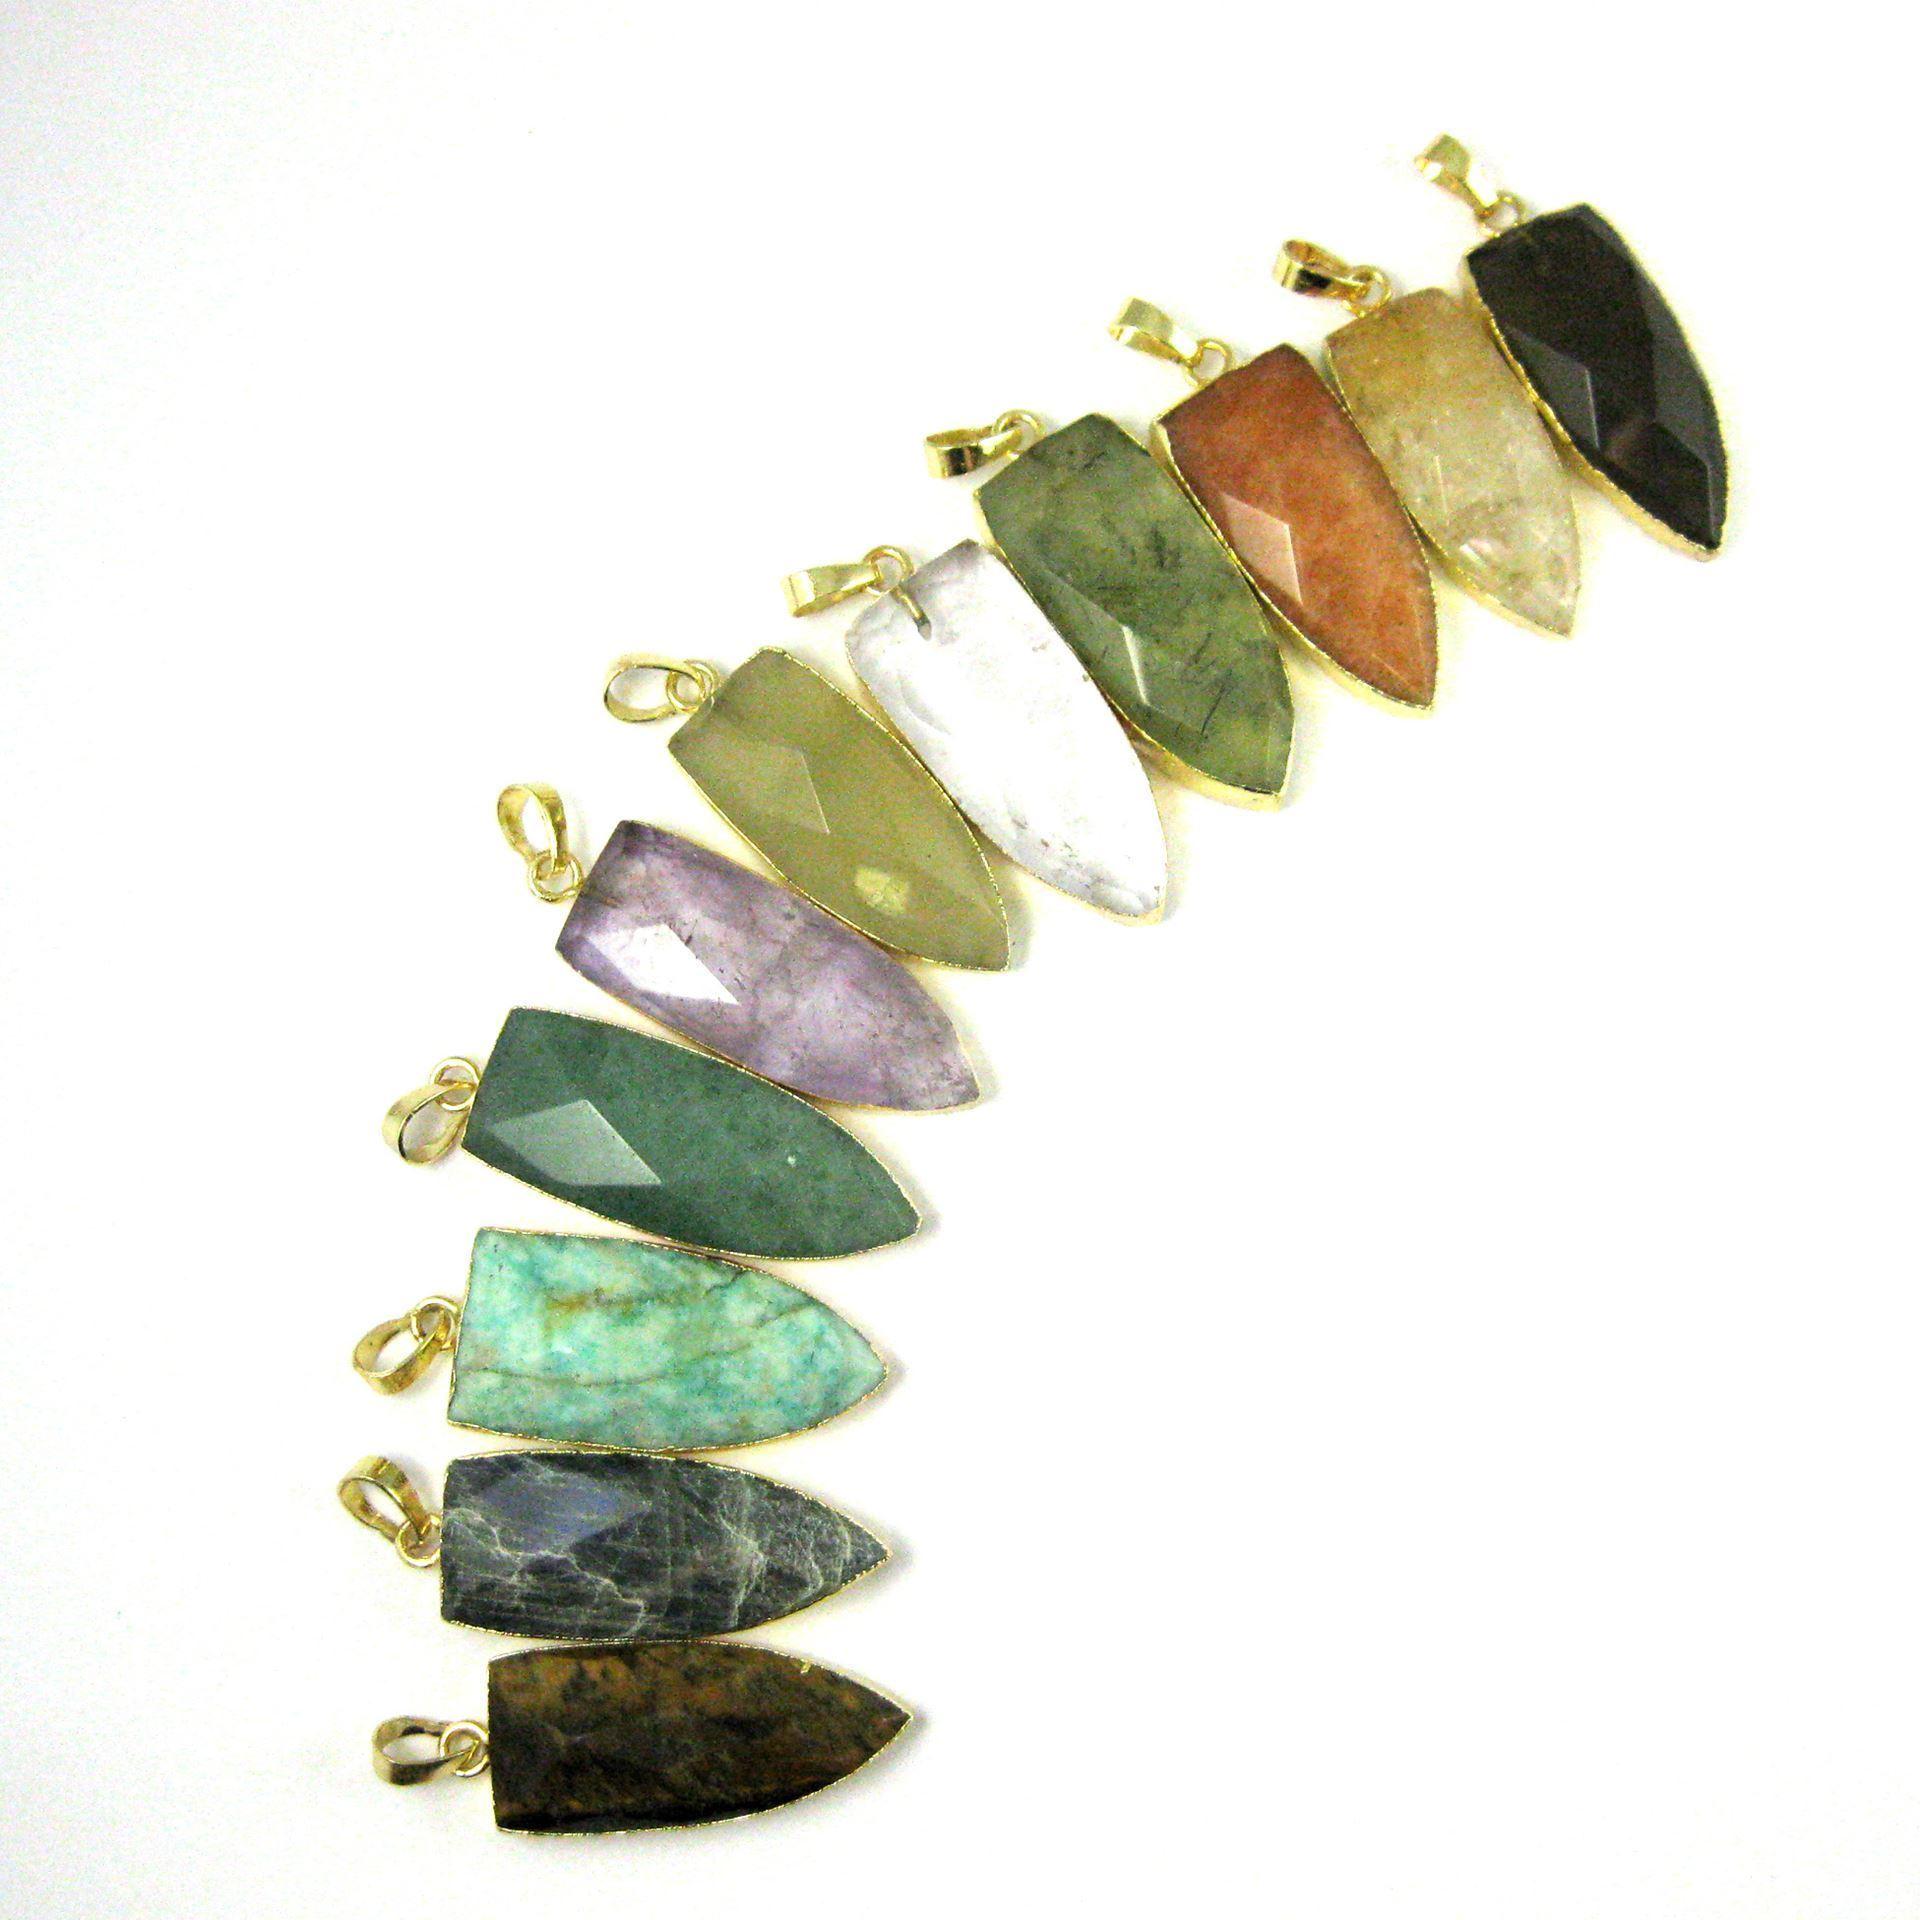 Gold Plated Faceted Arrowhead Pendant-Arrowhead charm-Natural Gemstone Spike Pendant - Smokey Quartz - 40mm